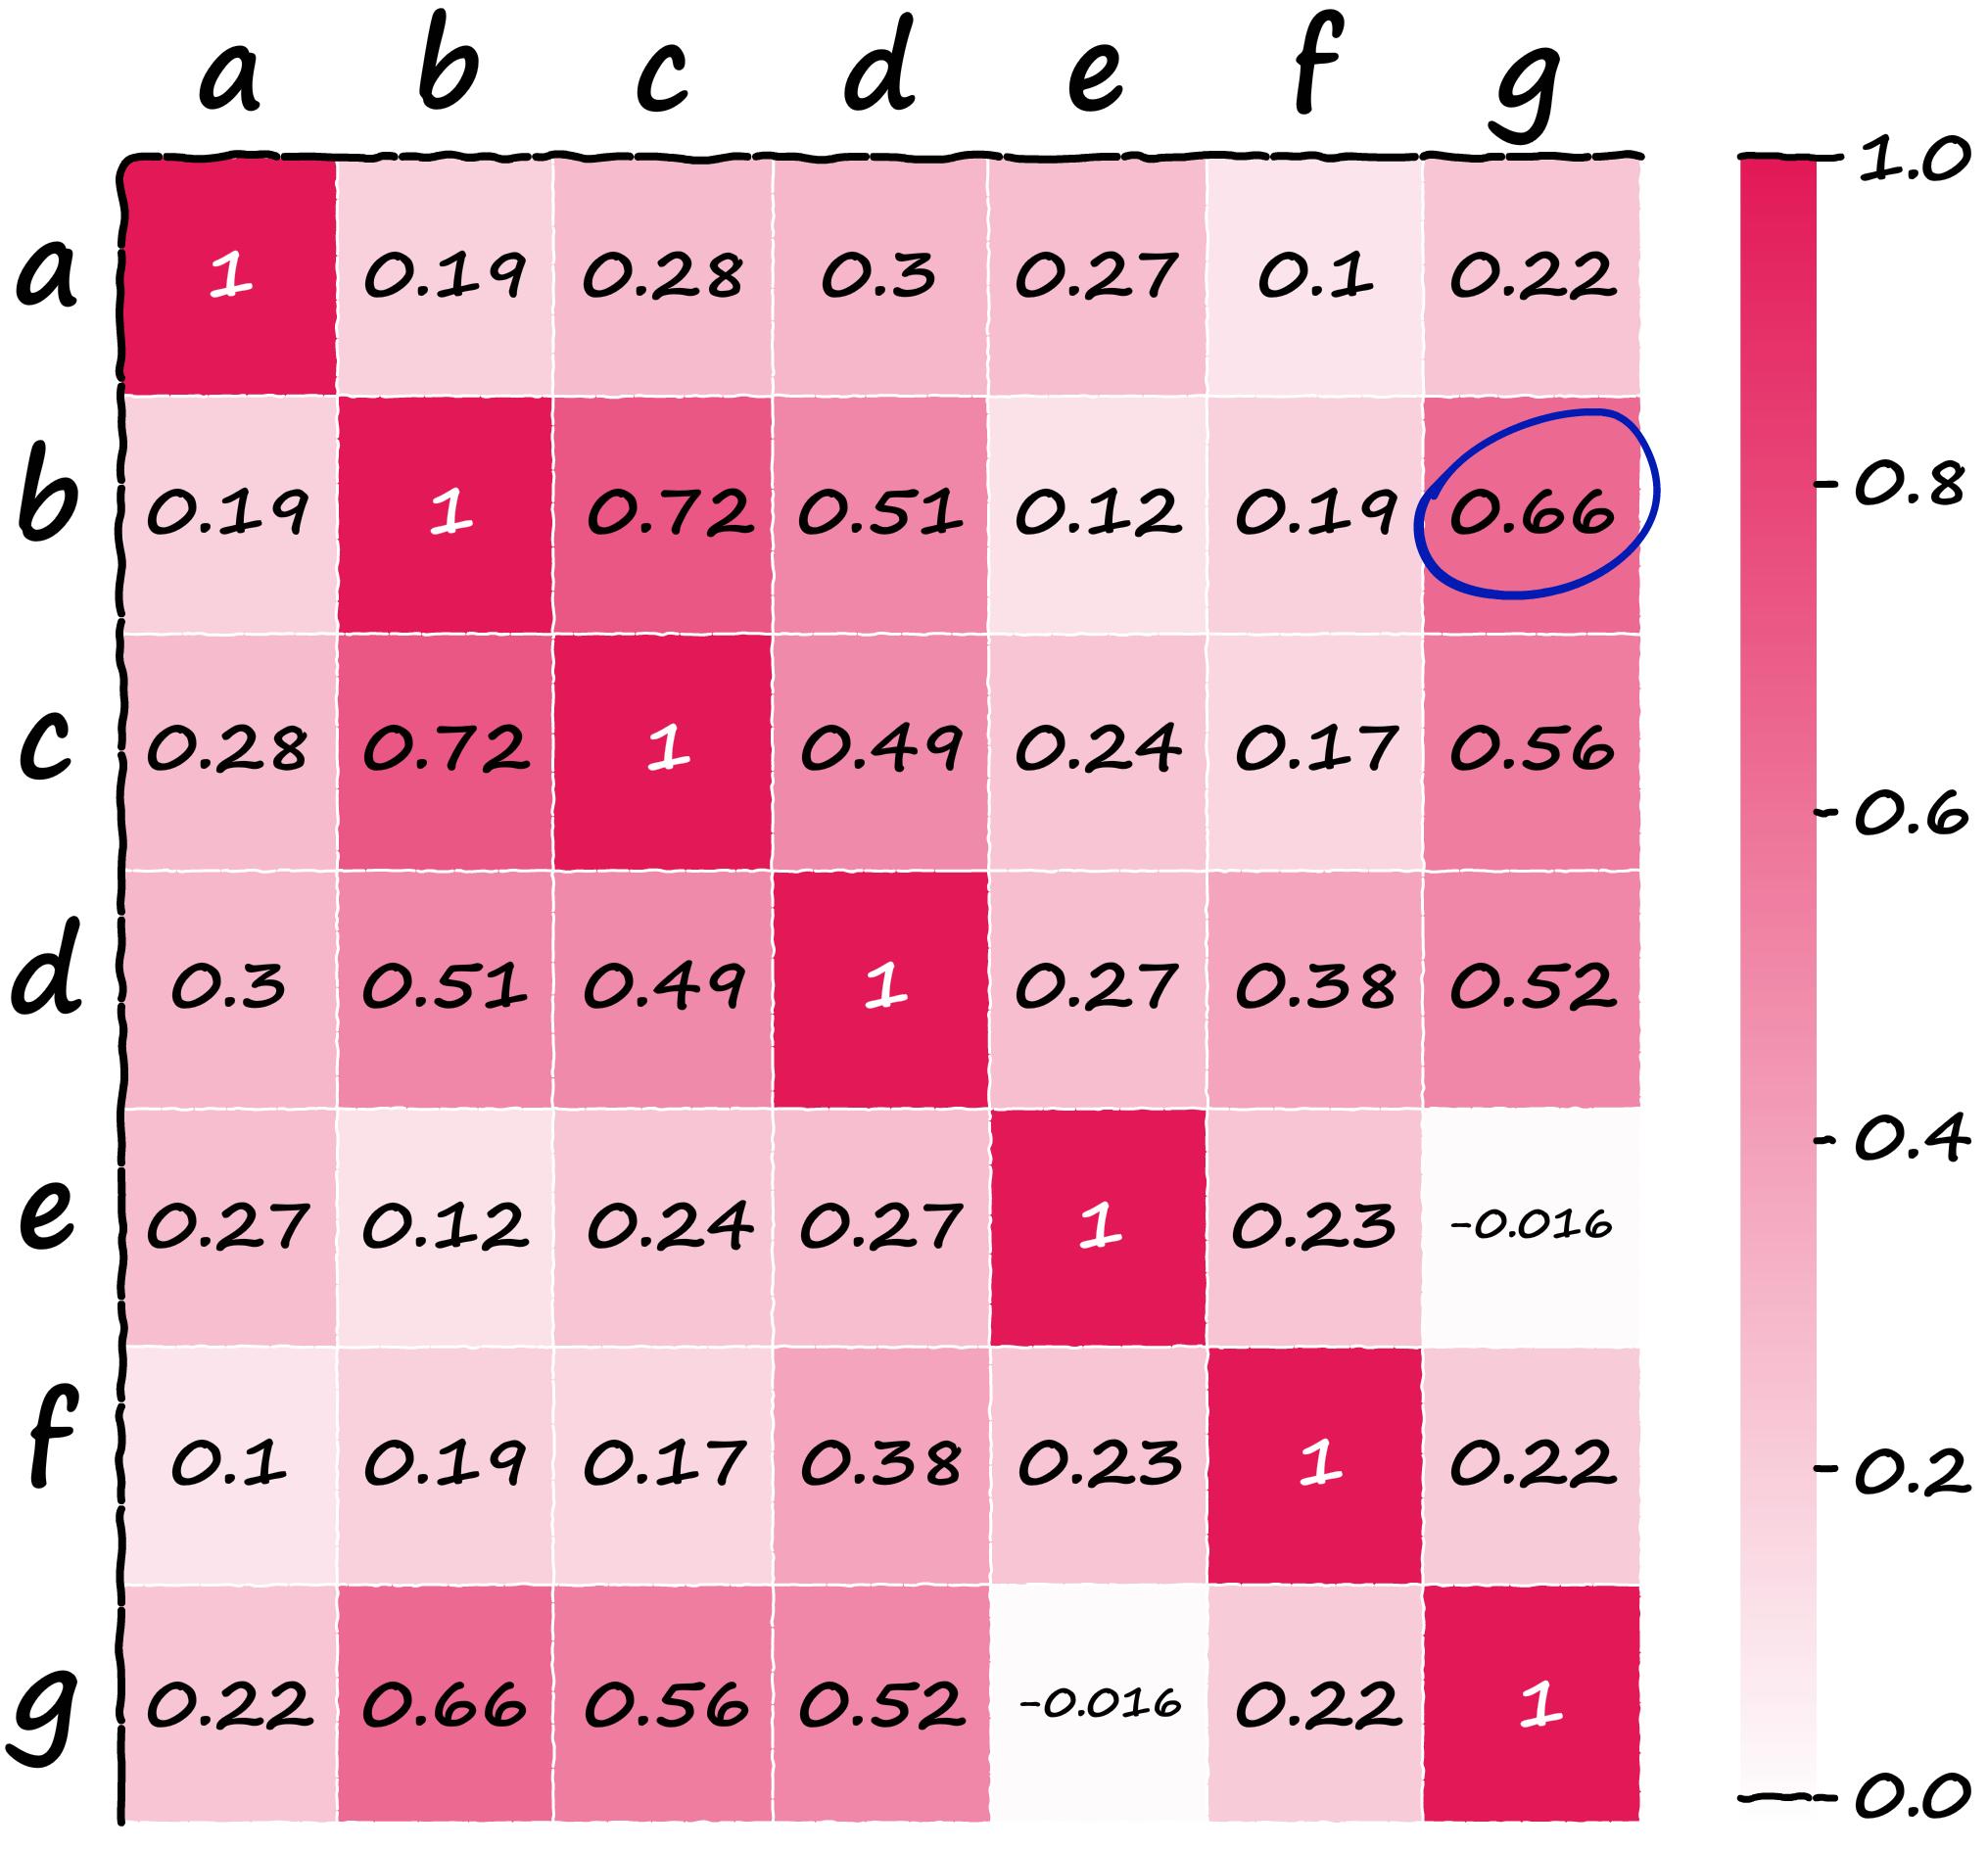 Heatmap showing cosine similarity between our SBERT sentence vectors — the score between sentences b and g is circled.